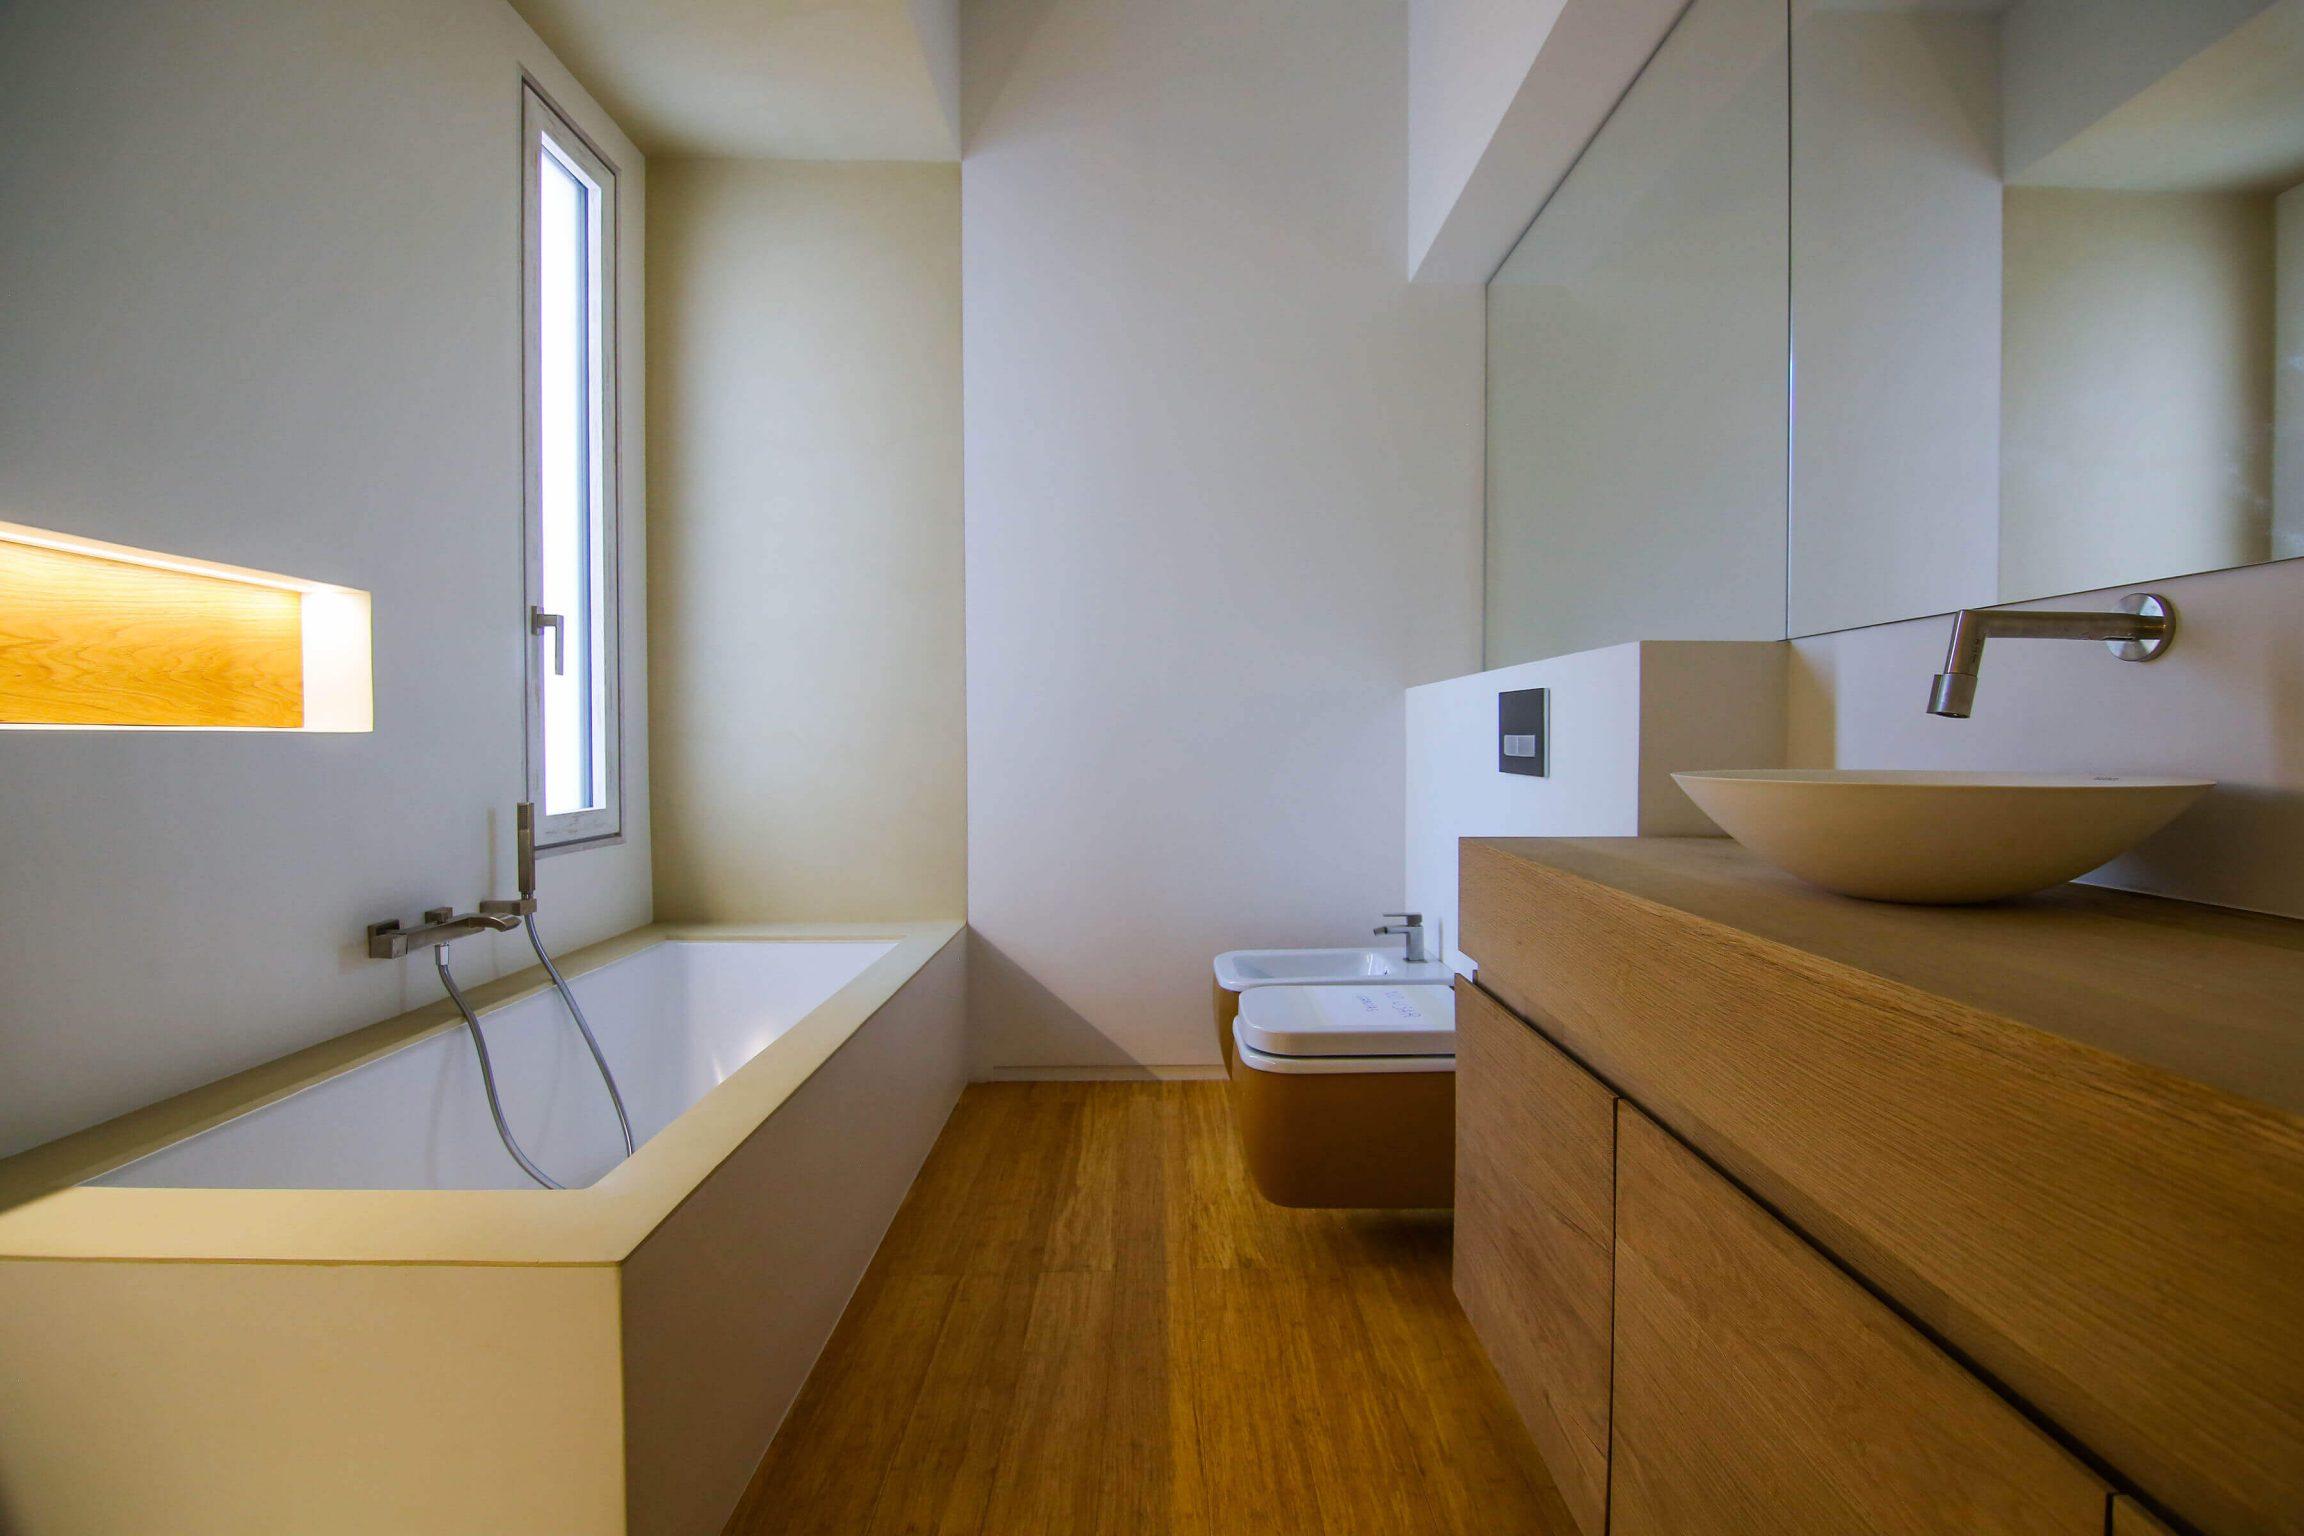 https://www.white-ibiza.com/wp-content/uploads/2021/06/white-ibiza-property-passivhaus-wi1853-01-2304x1536.jpg